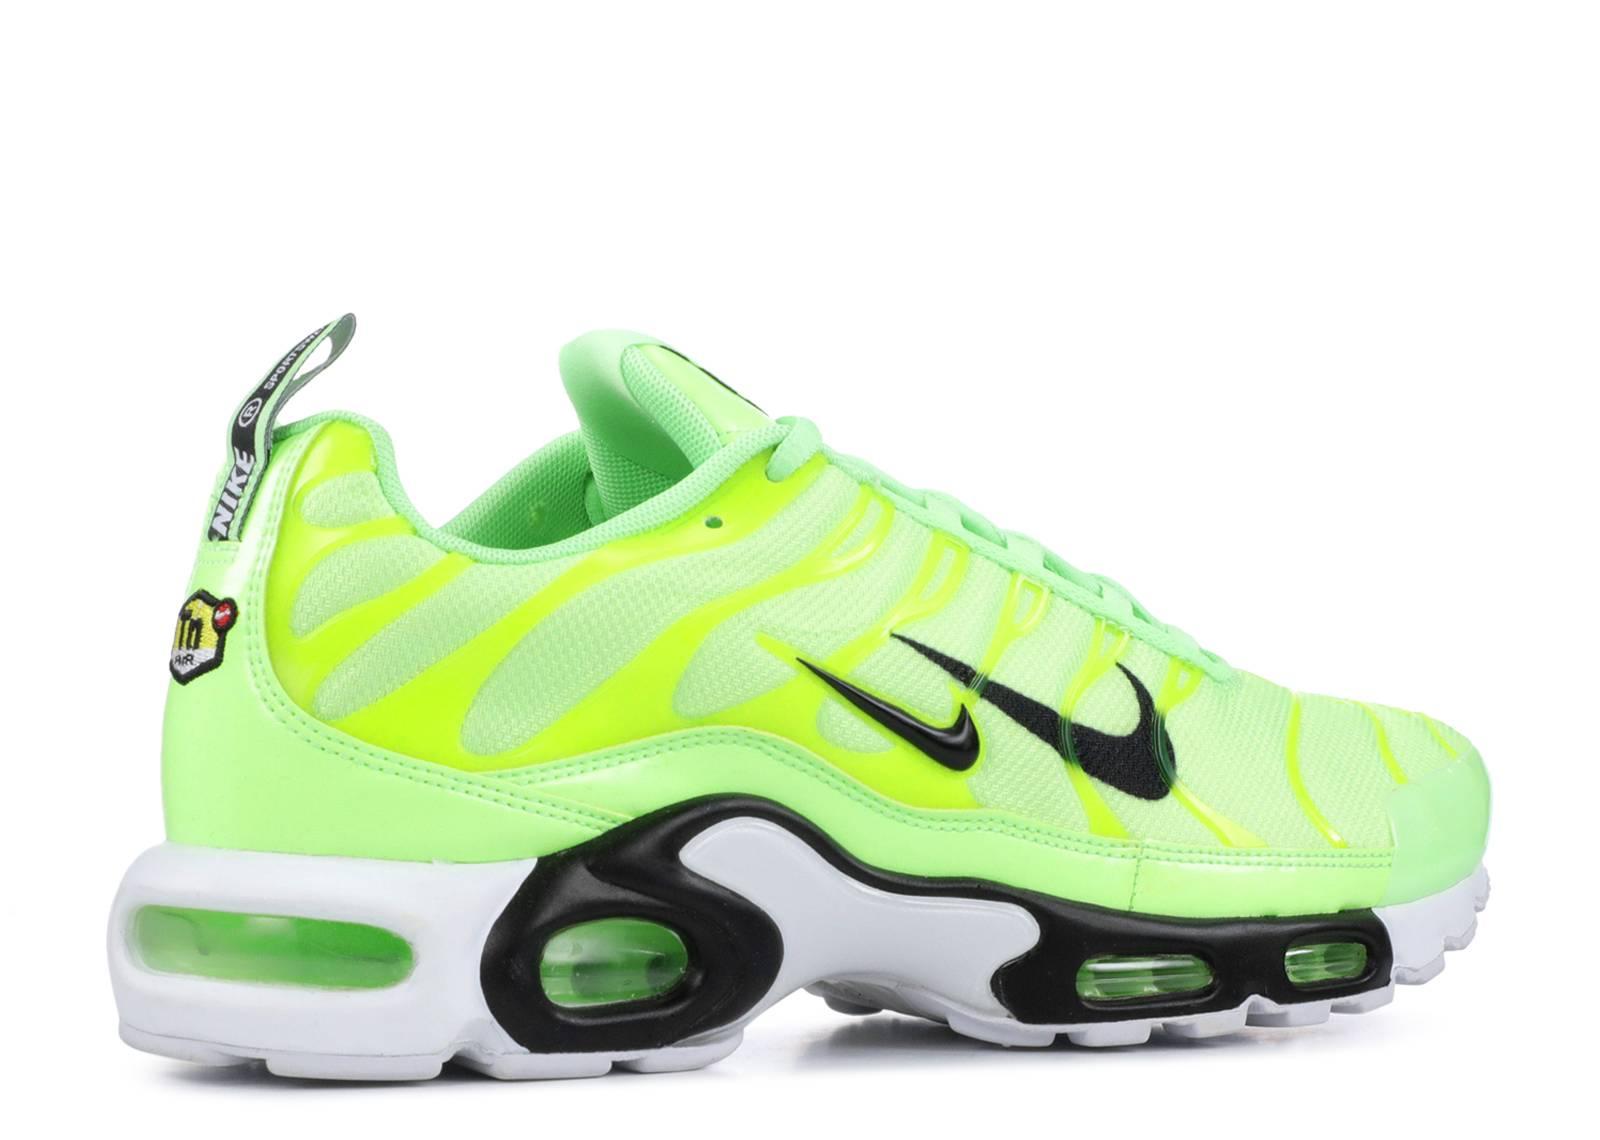 9ca8ec39e6 ... Nike Air Max Plus Premium 'Overbranding - Lime Blast'